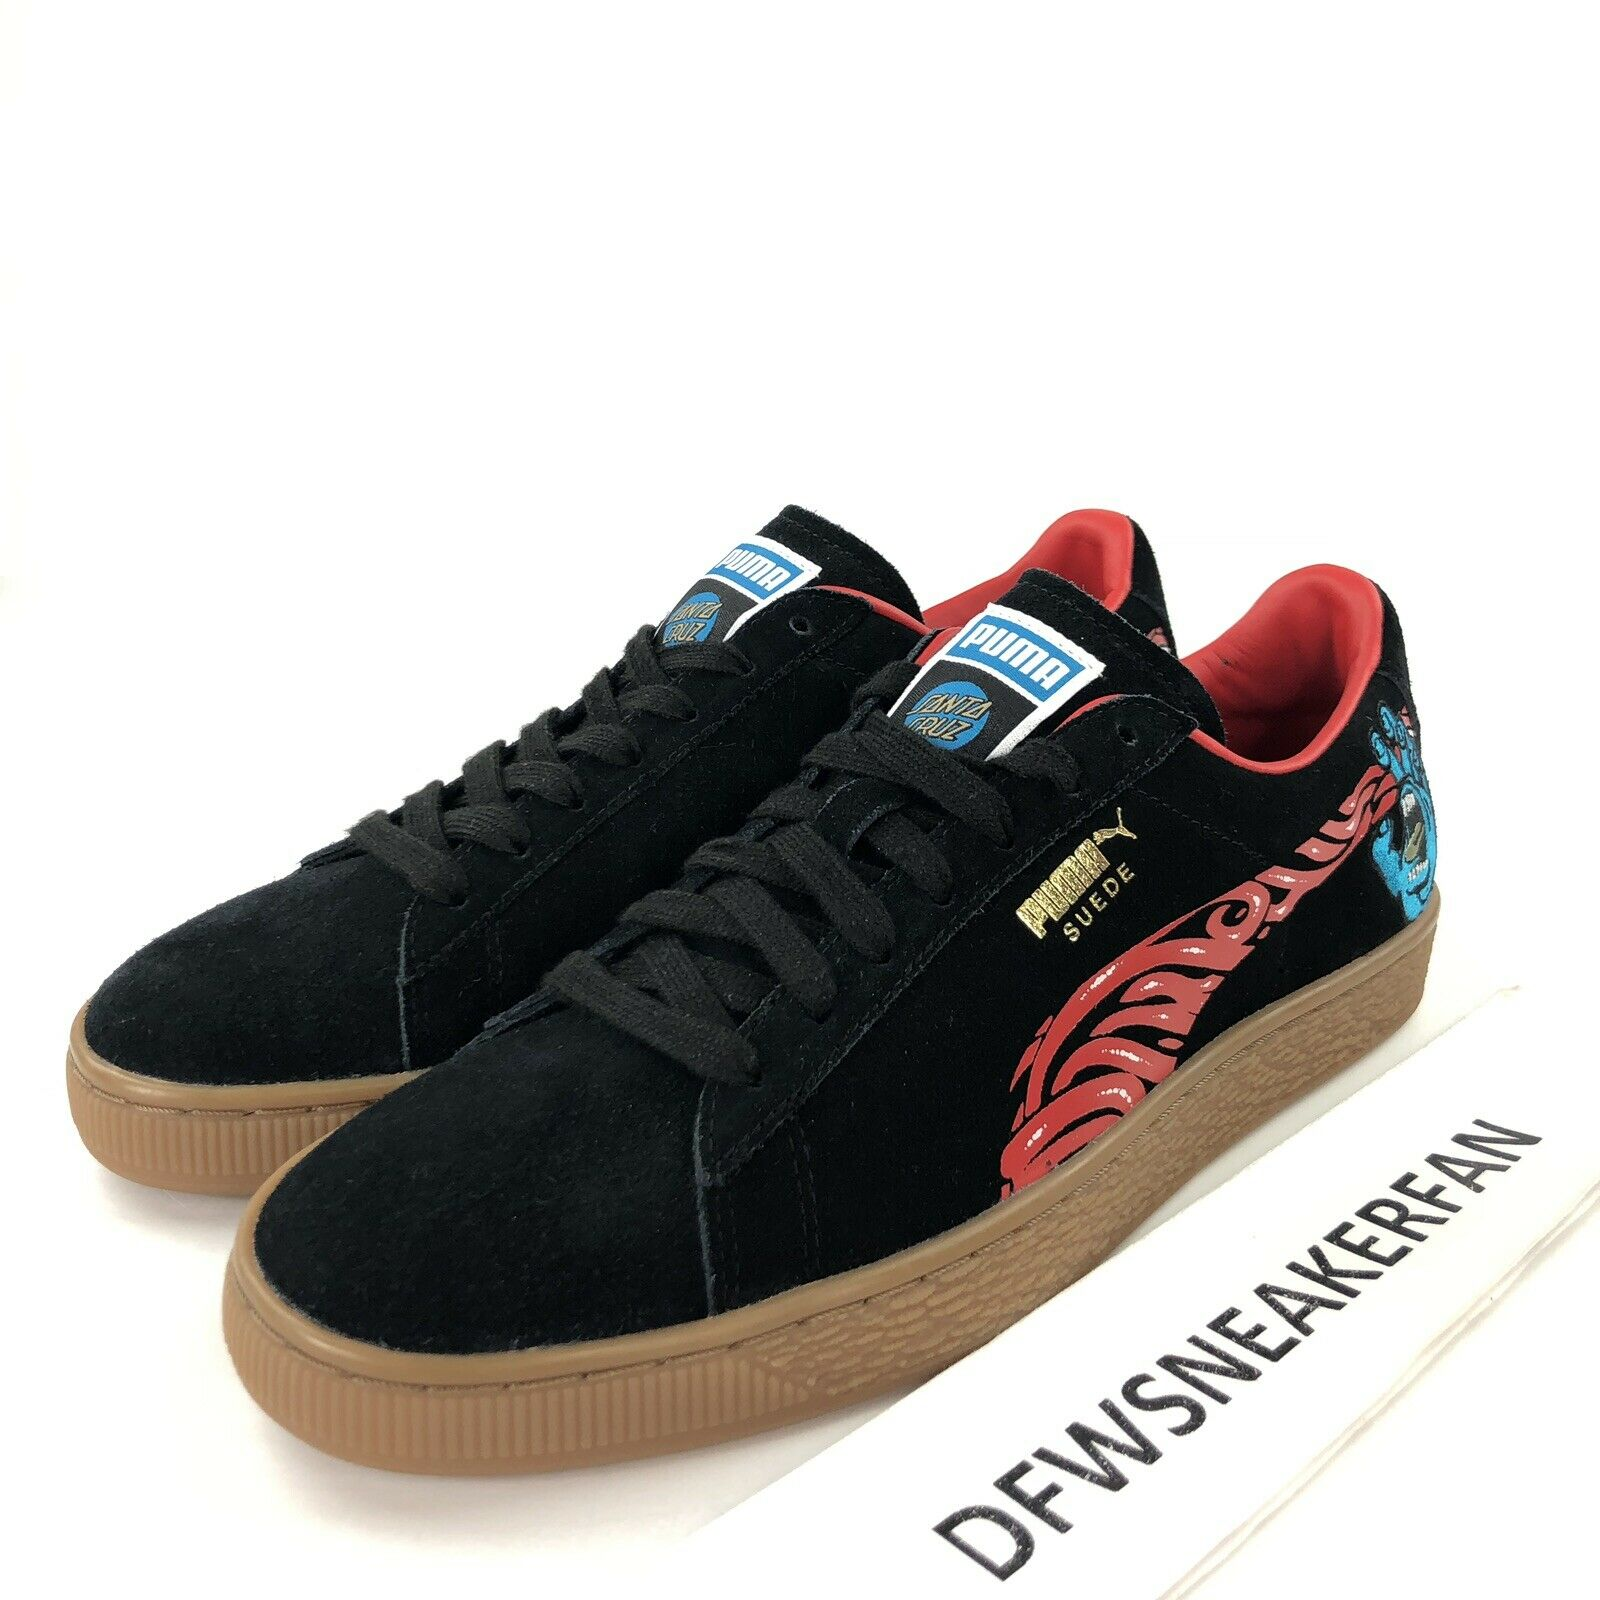 Puma x Santa Cruz Suede Classic Men's 9 Black Gum Roskopp Screaming Hand shoes